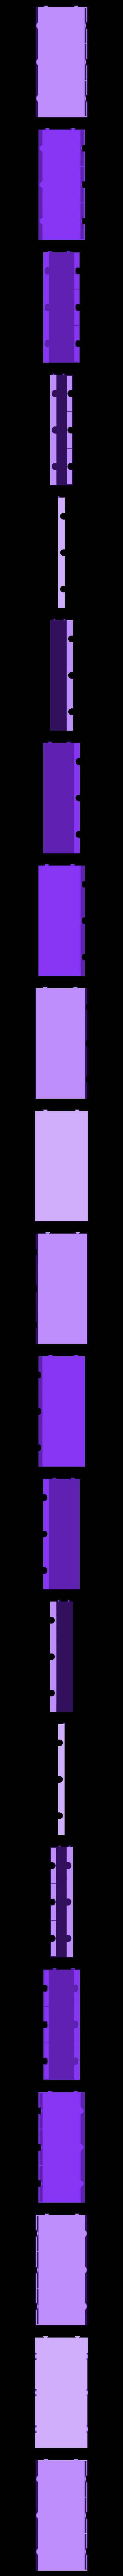 Hero_Epic_Item.stl Télécharger fichier STL gratuit Boss Monster Dungeon Board & Card Holders • Plan pour impression 3D, jbrum360